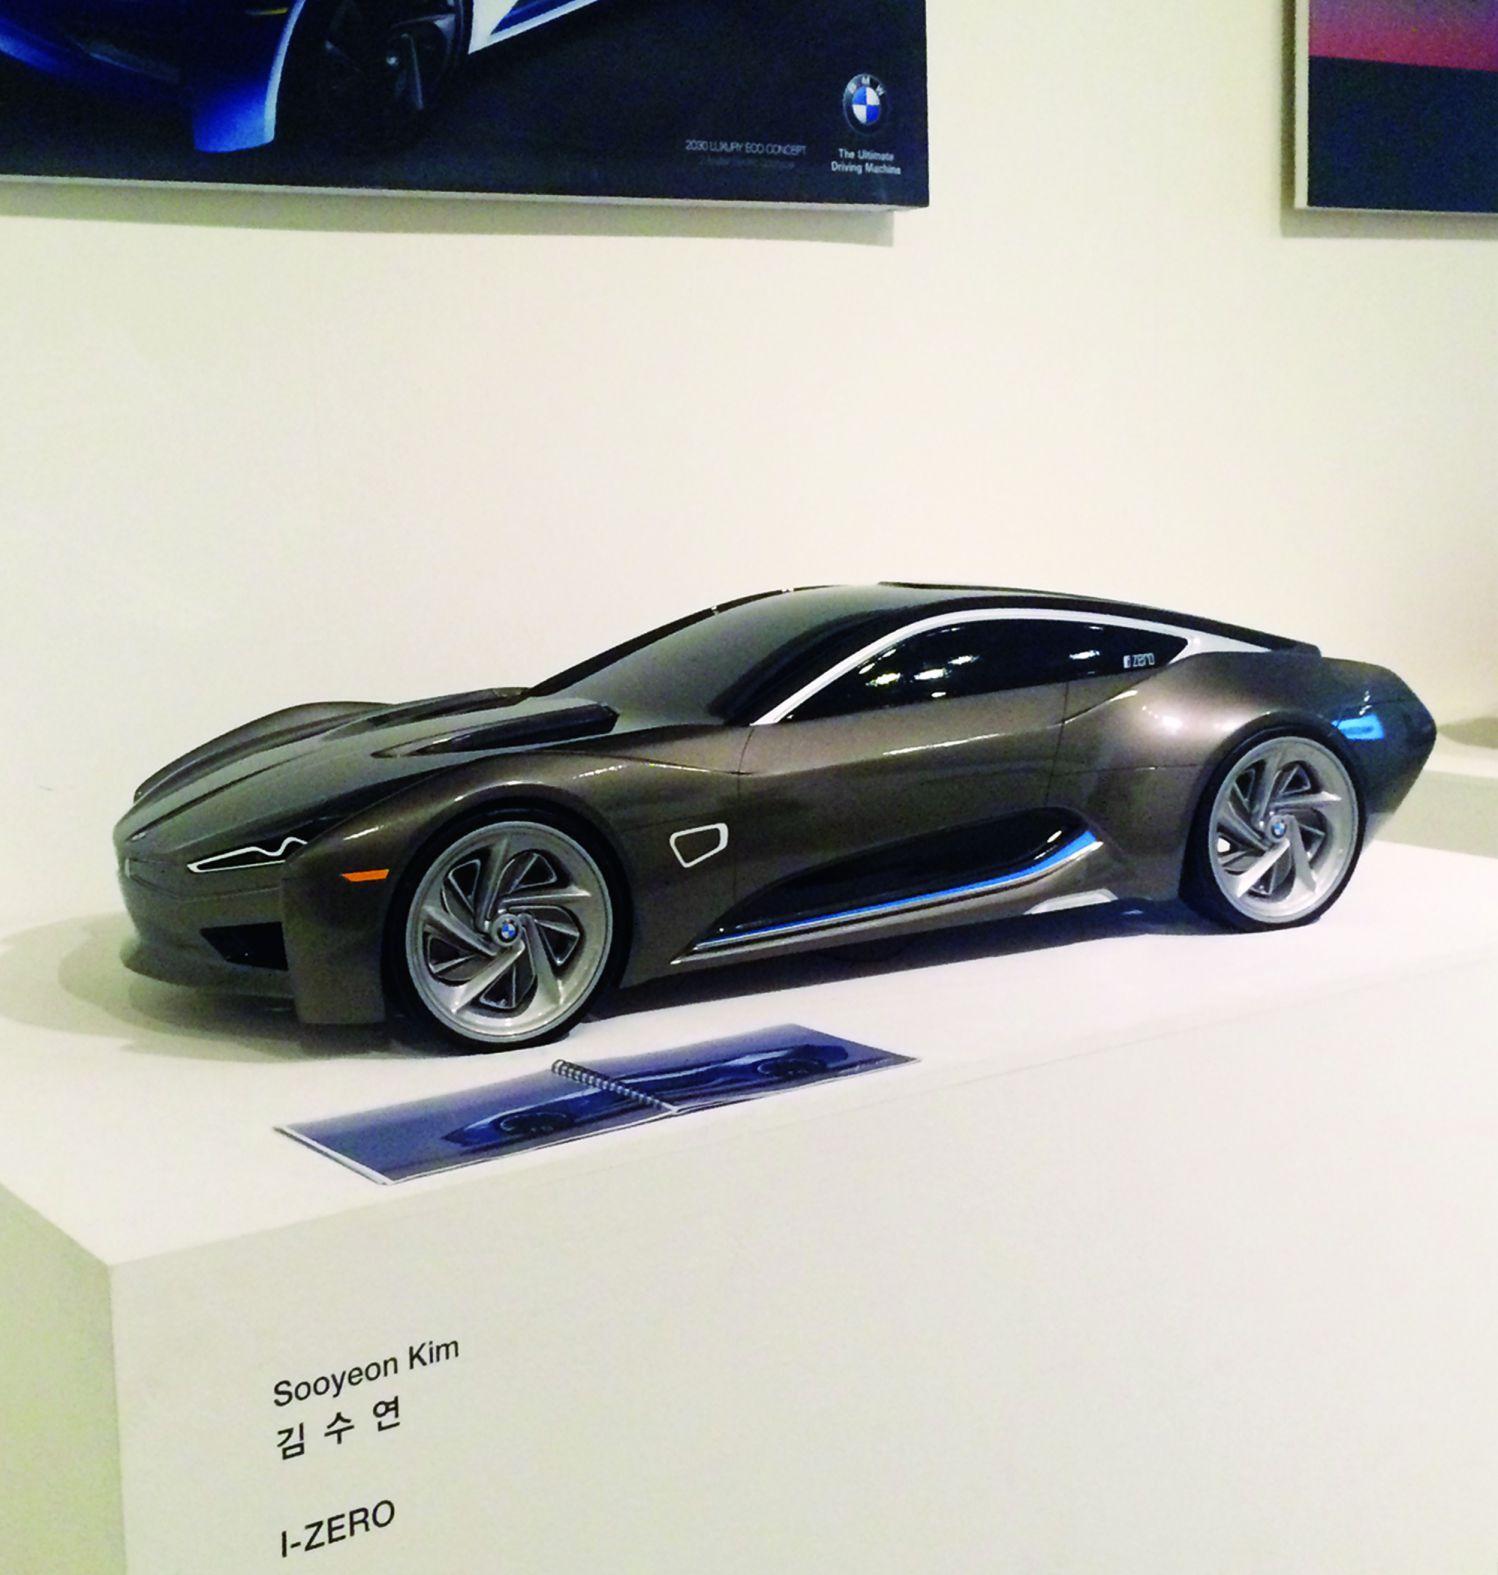 Sooyeonkim 13 Compressed Jpg 1498 1575 Bmw Concept Concept Cars Concept Car Design